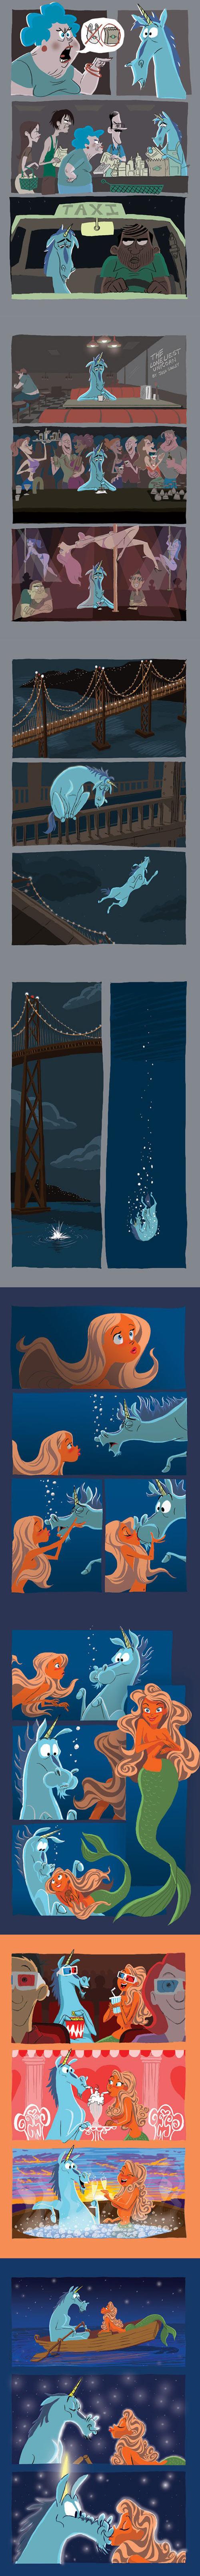 funny-lonely-unicorn-mermaid-comic